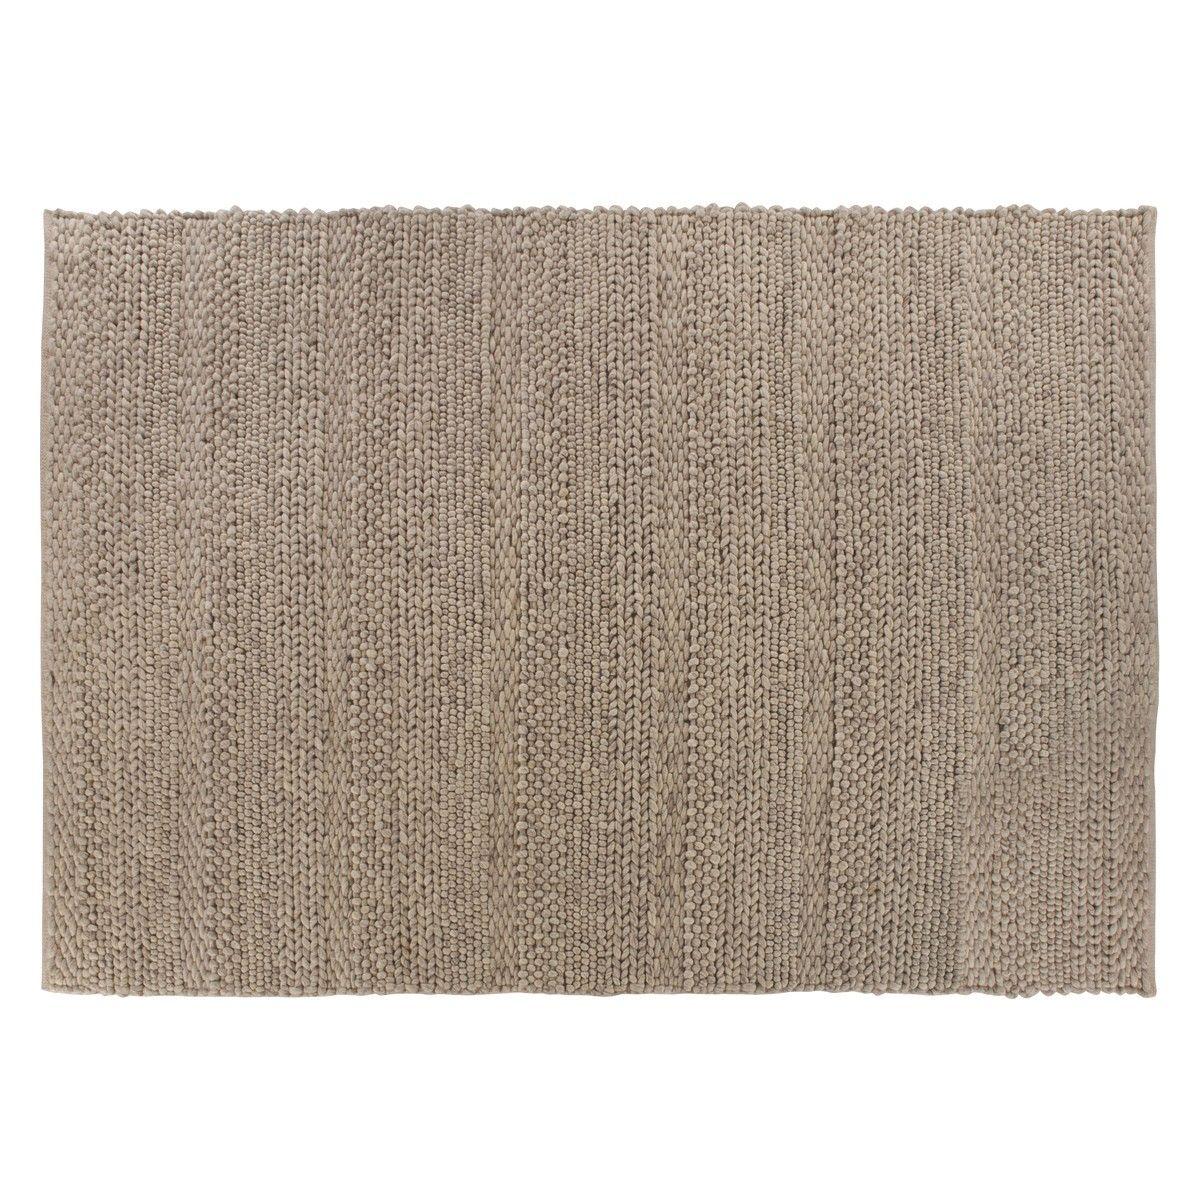 Habitat Rugs Wool Rug Lounge